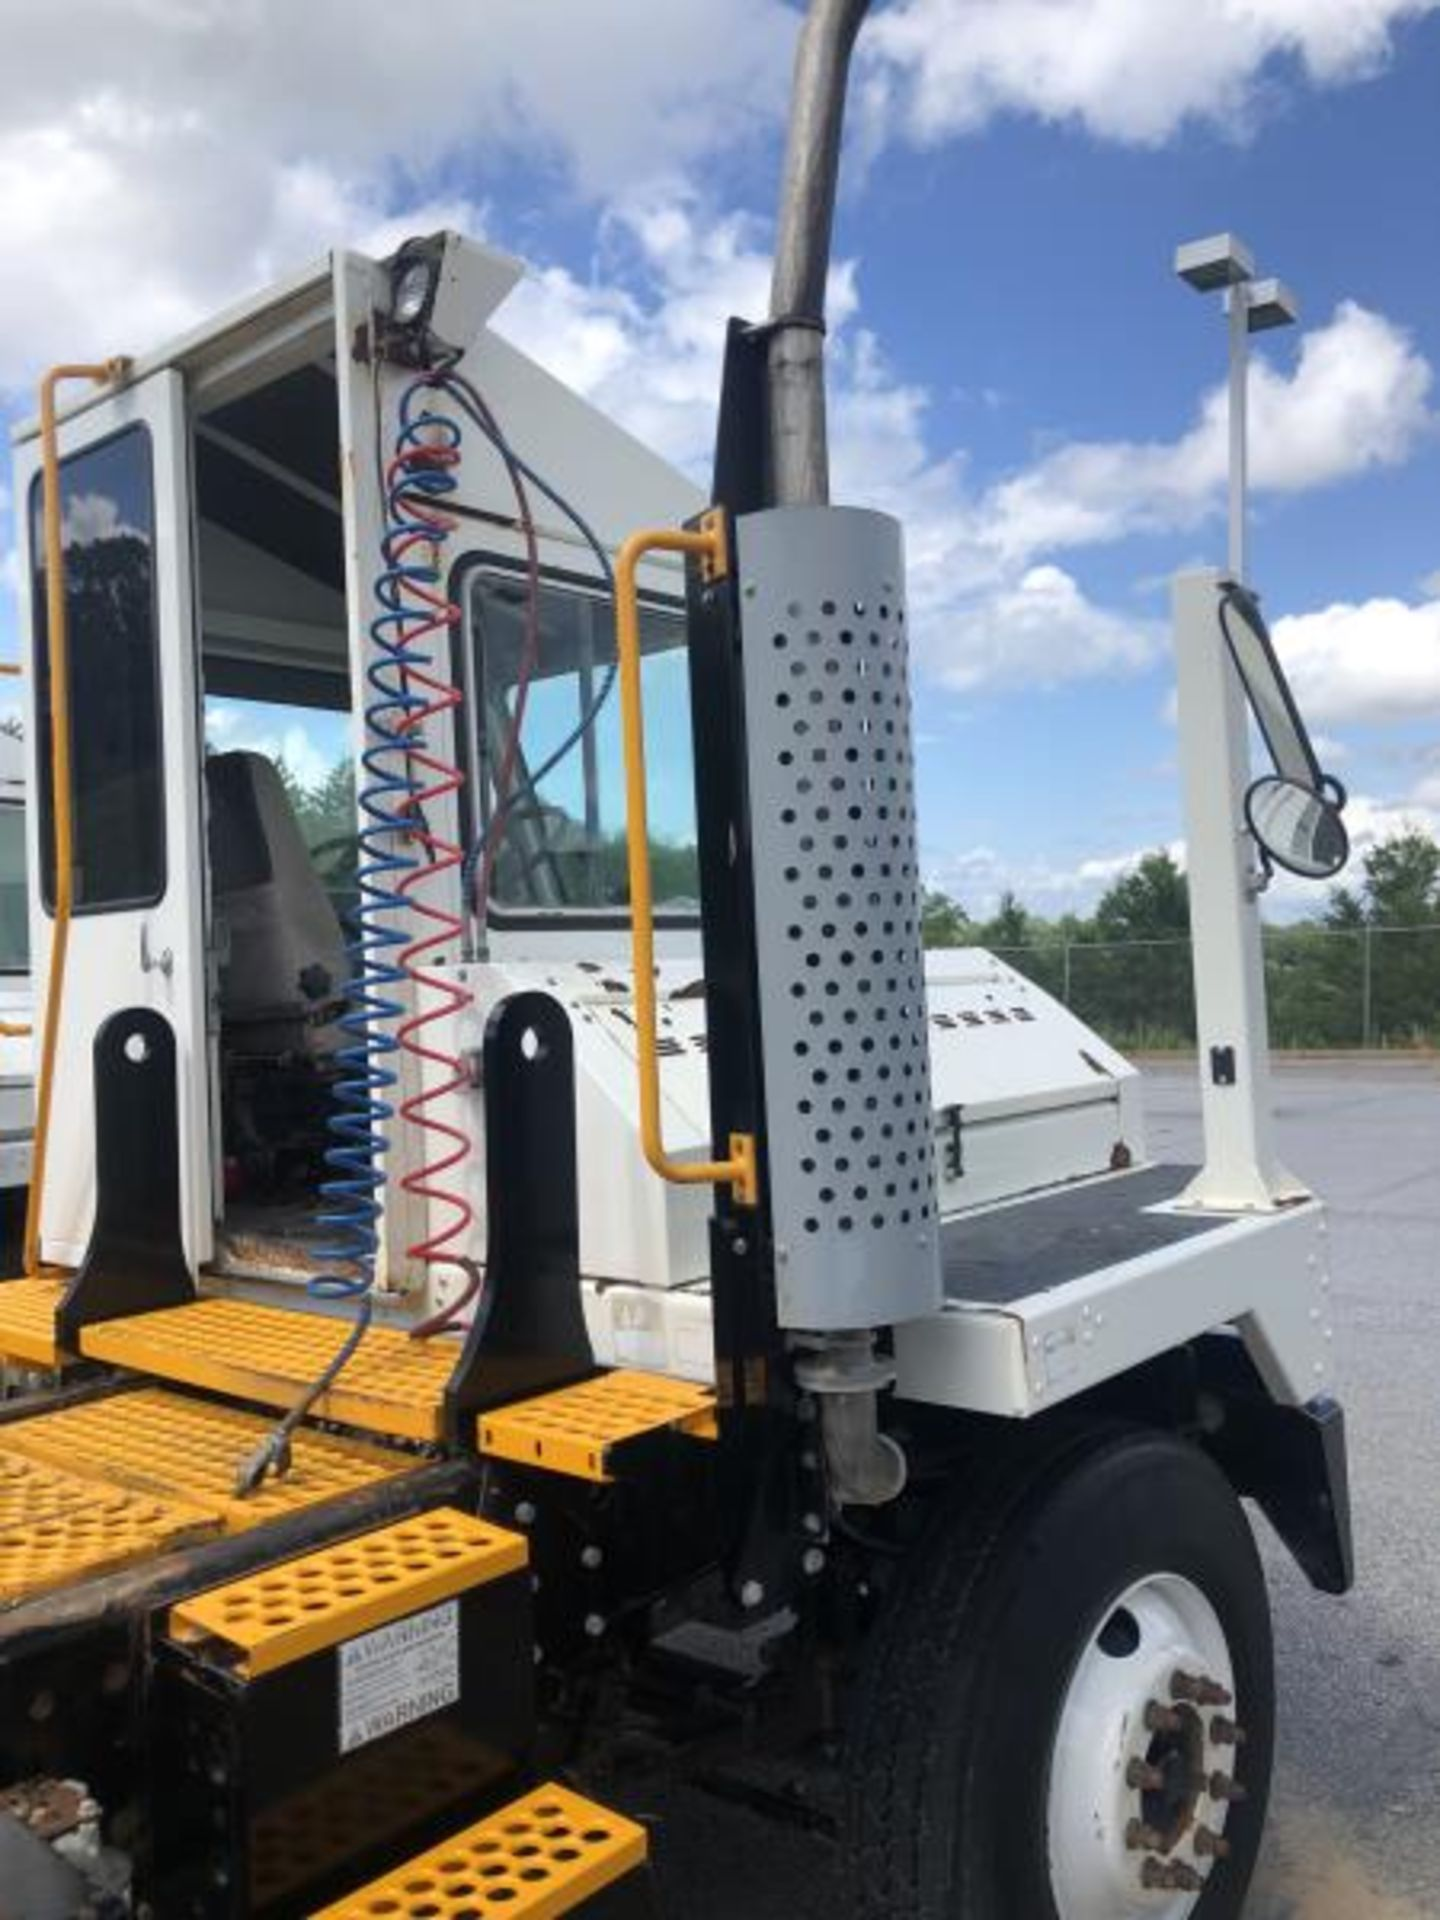 2015 Kalmar Ottawa 4x2 Yard Truck , SN: 338842 1,308.2 Hours, 937 Miles - Image 13 of 27